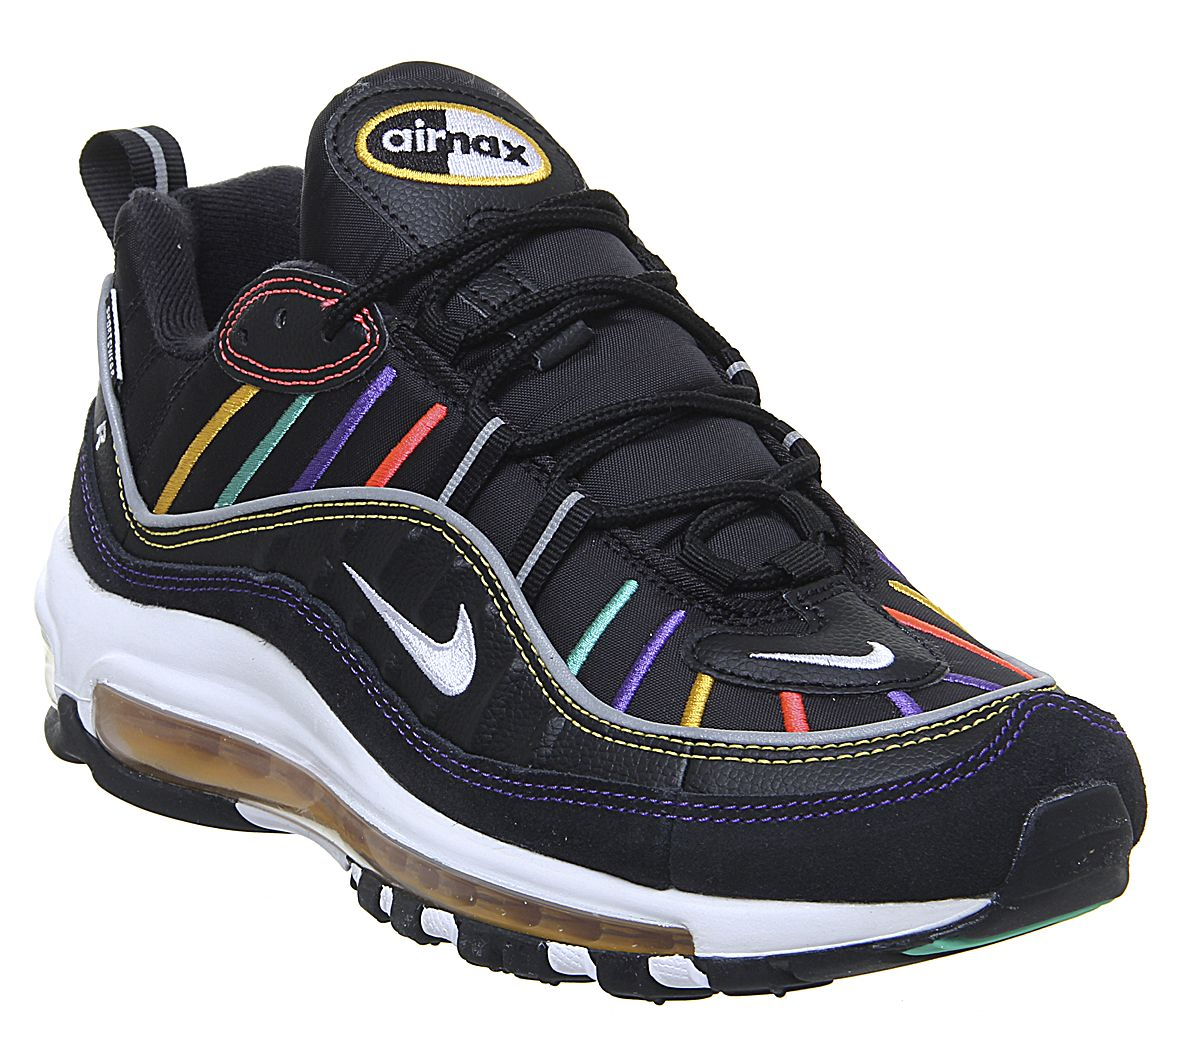 huge selection of 3acf1 3f696 Nike Air Max 98 Trainers Black Flash Crimson Kinetic Green ...